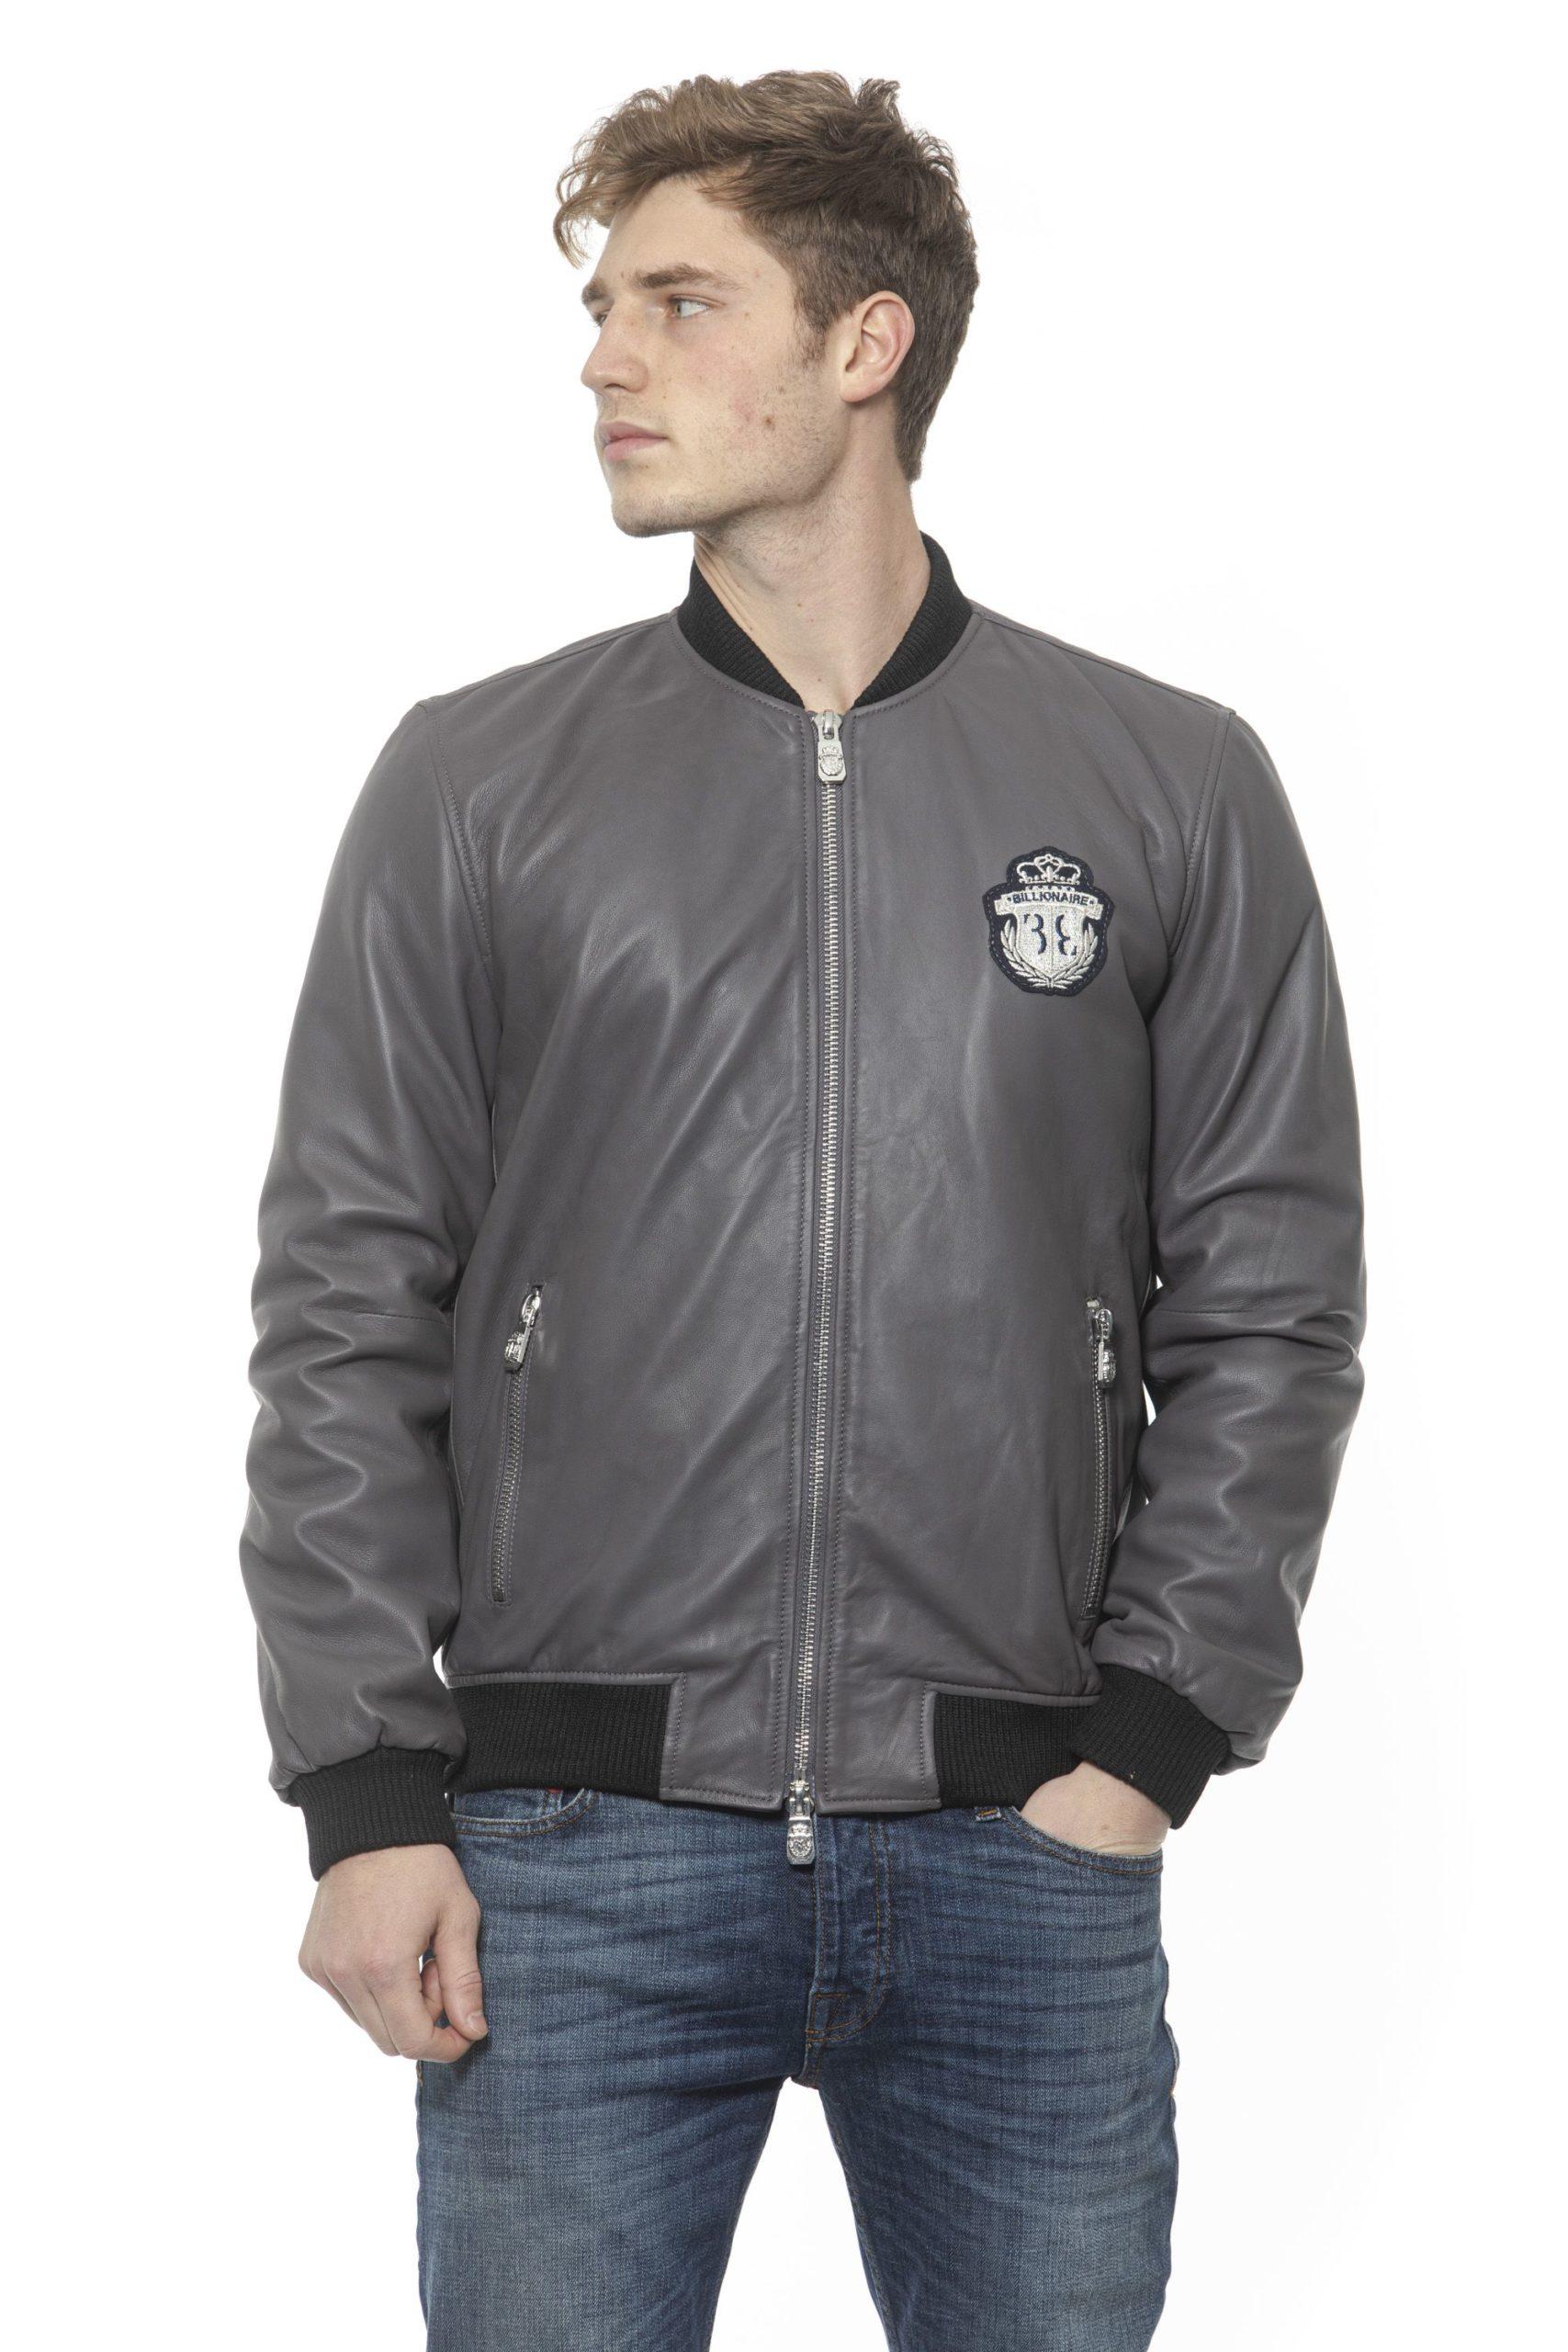 Billionaire Italian Couture Men's Grigio Jacket Grey BI1313398 - M